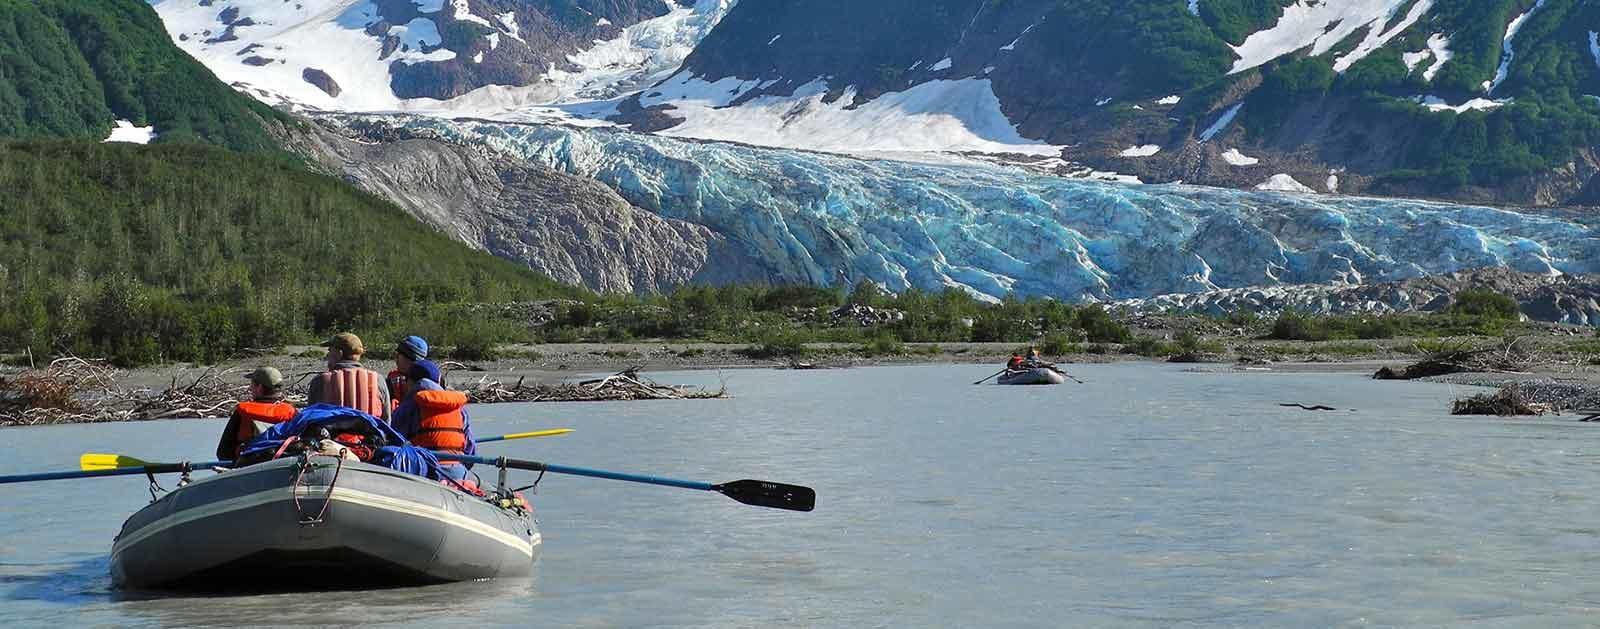 Walker Glacier, Alsek River, AK | Photo by Mike Fiebig